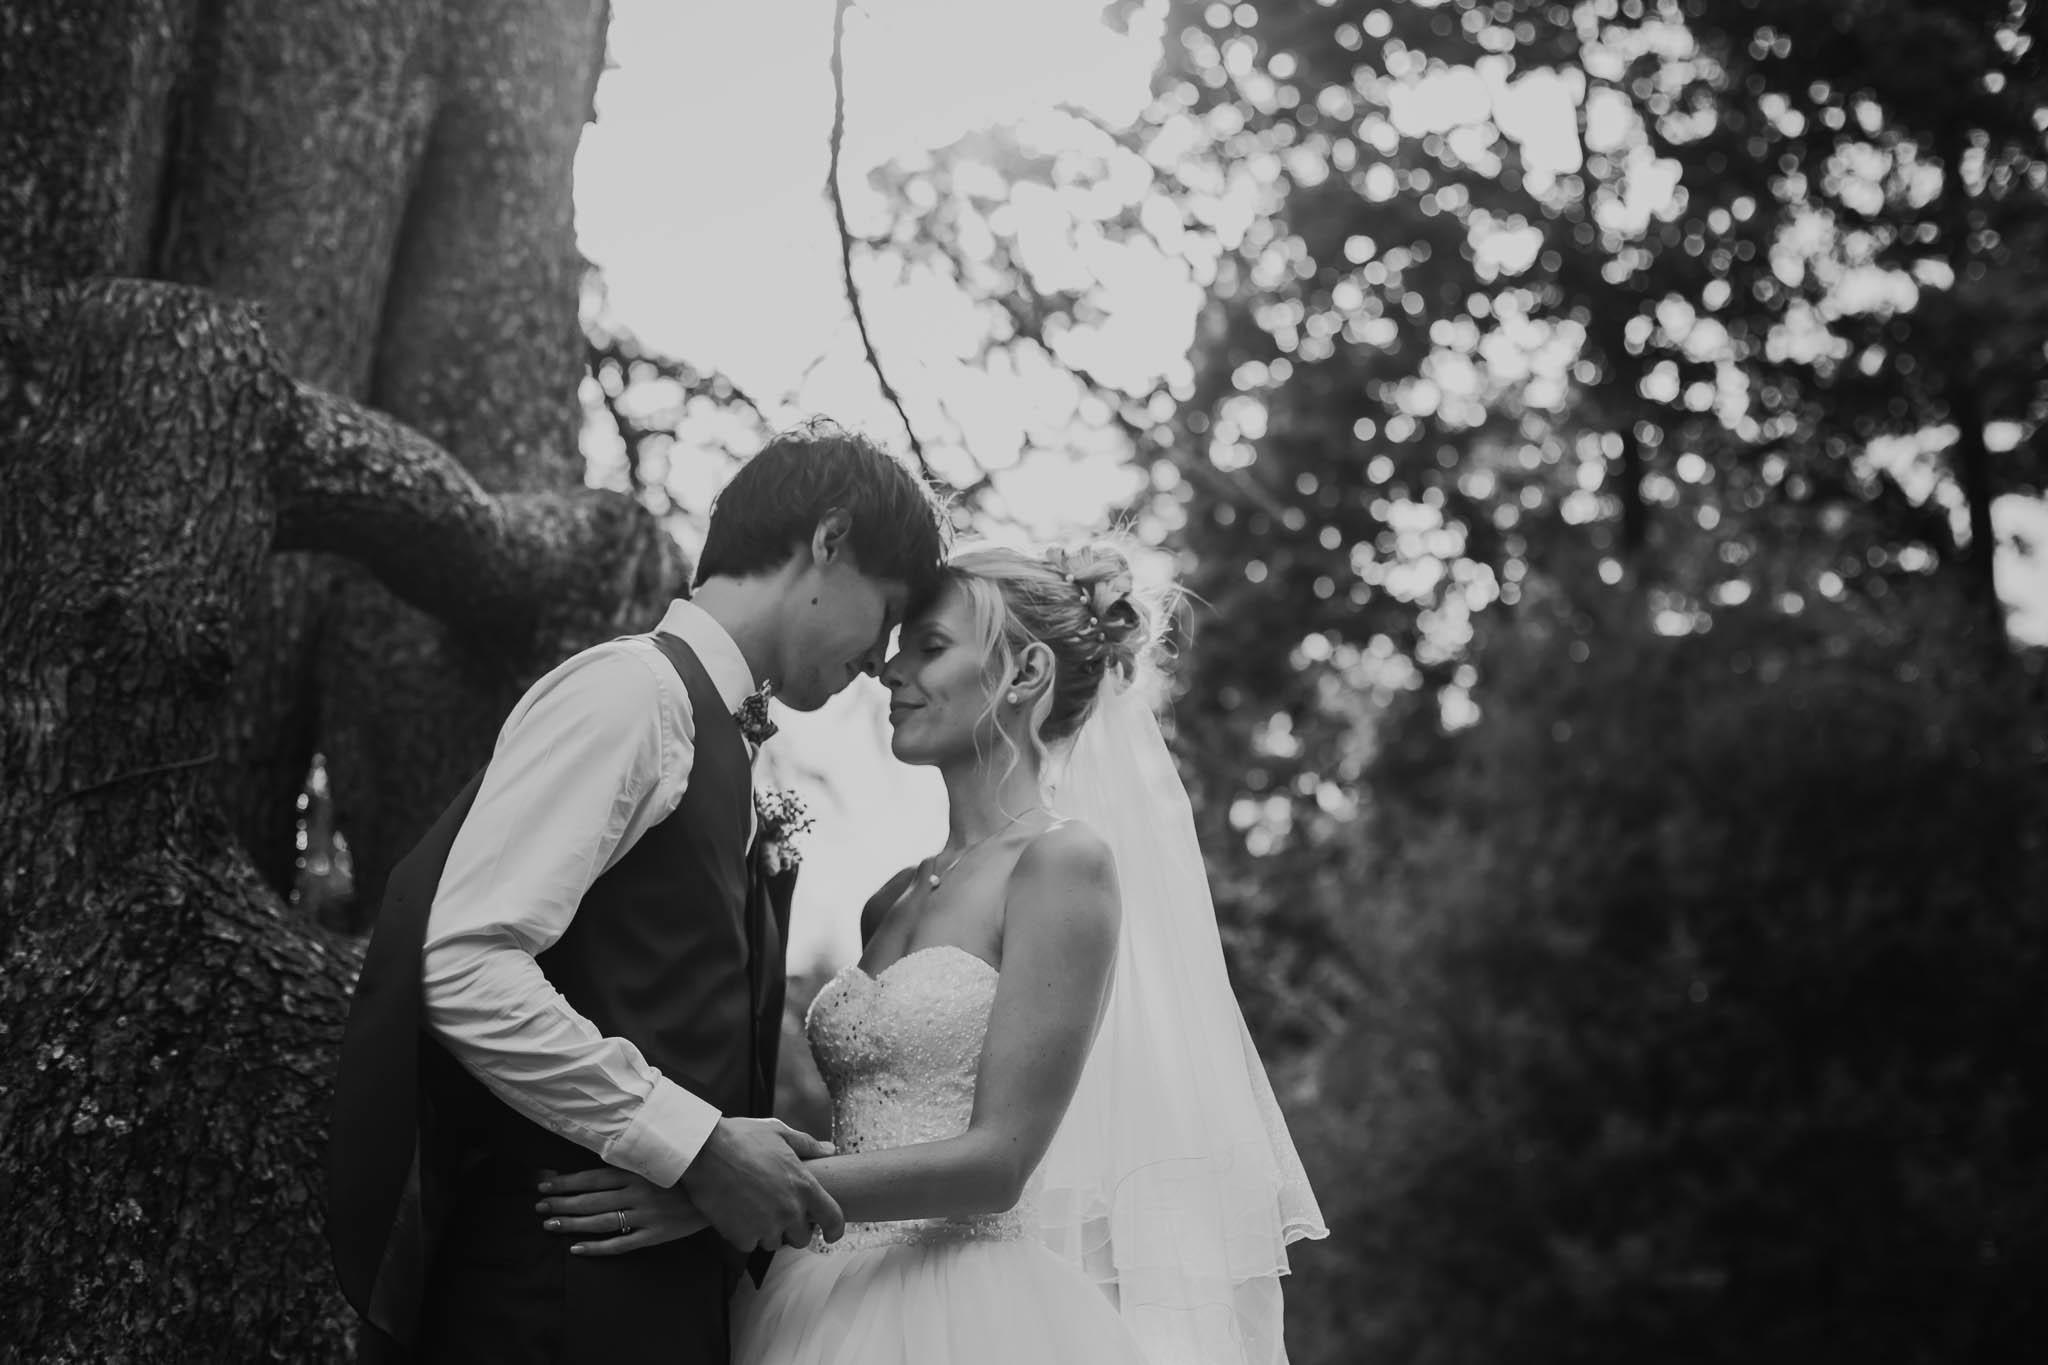 mariage-chateau-gaudras-ingold-69.jpg